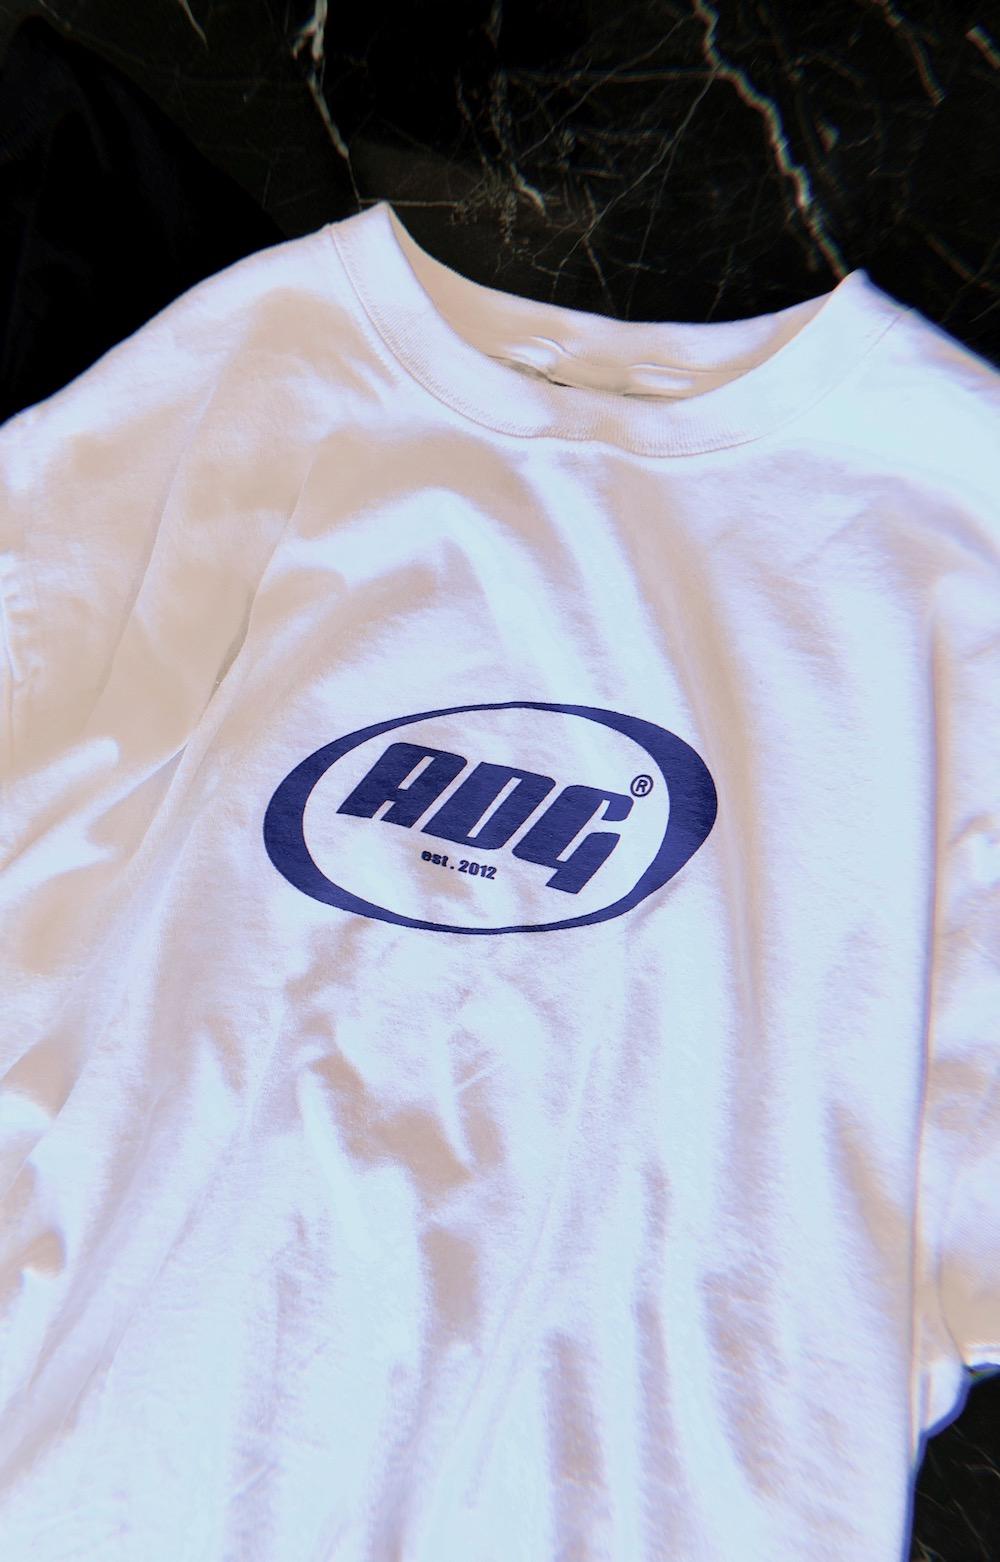 ADG OVAL LOGO BIG TEE (white-blue logo)